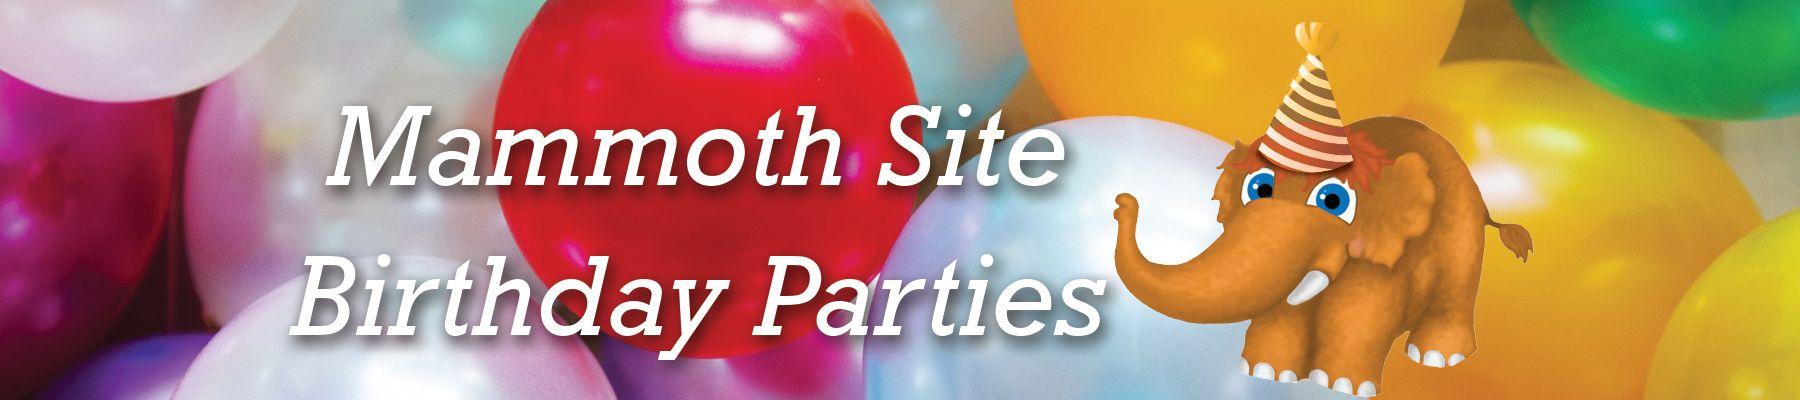 Mammoth Site Birthday Parties Graphic